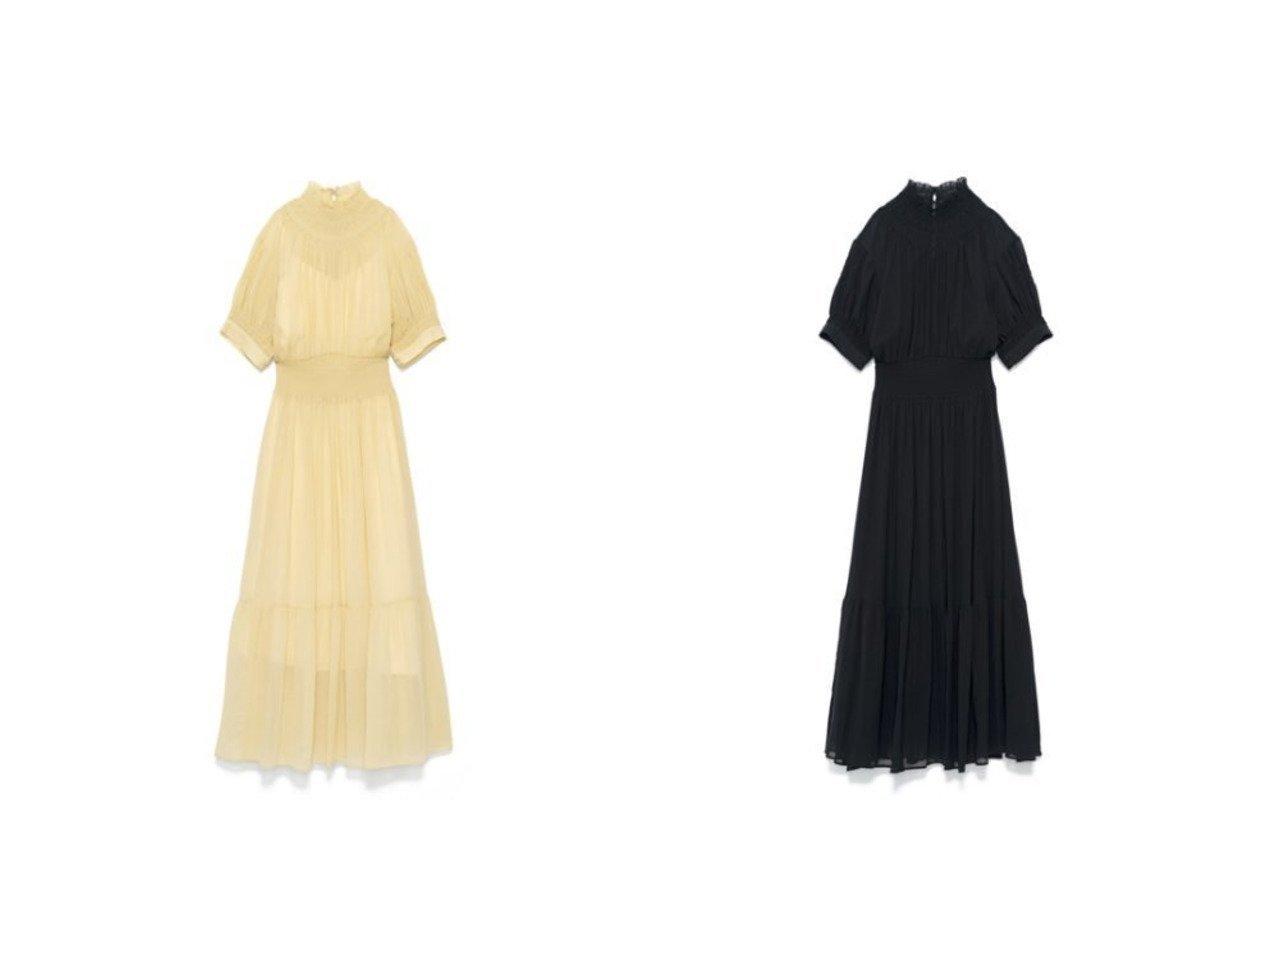 【CASA FLINE/カーサフライン】のハイネックタックパフスリーブドレス CASA FLINEのおすすめ!人気、トレンド・レディースファッションの通販 おすすめで人気の流行・トレンド、ファッションの通販商品 メンズファッション・キッズファッション・インテリア・家具・レディースファッション・服の通販 founy(ファニー) https://founy.com/ ファッション Fashion レディースファッション WOMEN ワンピース Dress ドレス Party Dresses イエロー インナー オケージョン キャミソール シャーリング デコルテ ドレス ドレープ フェミニン フォーマル リラックス 半袖 |ID:crp329100000018052